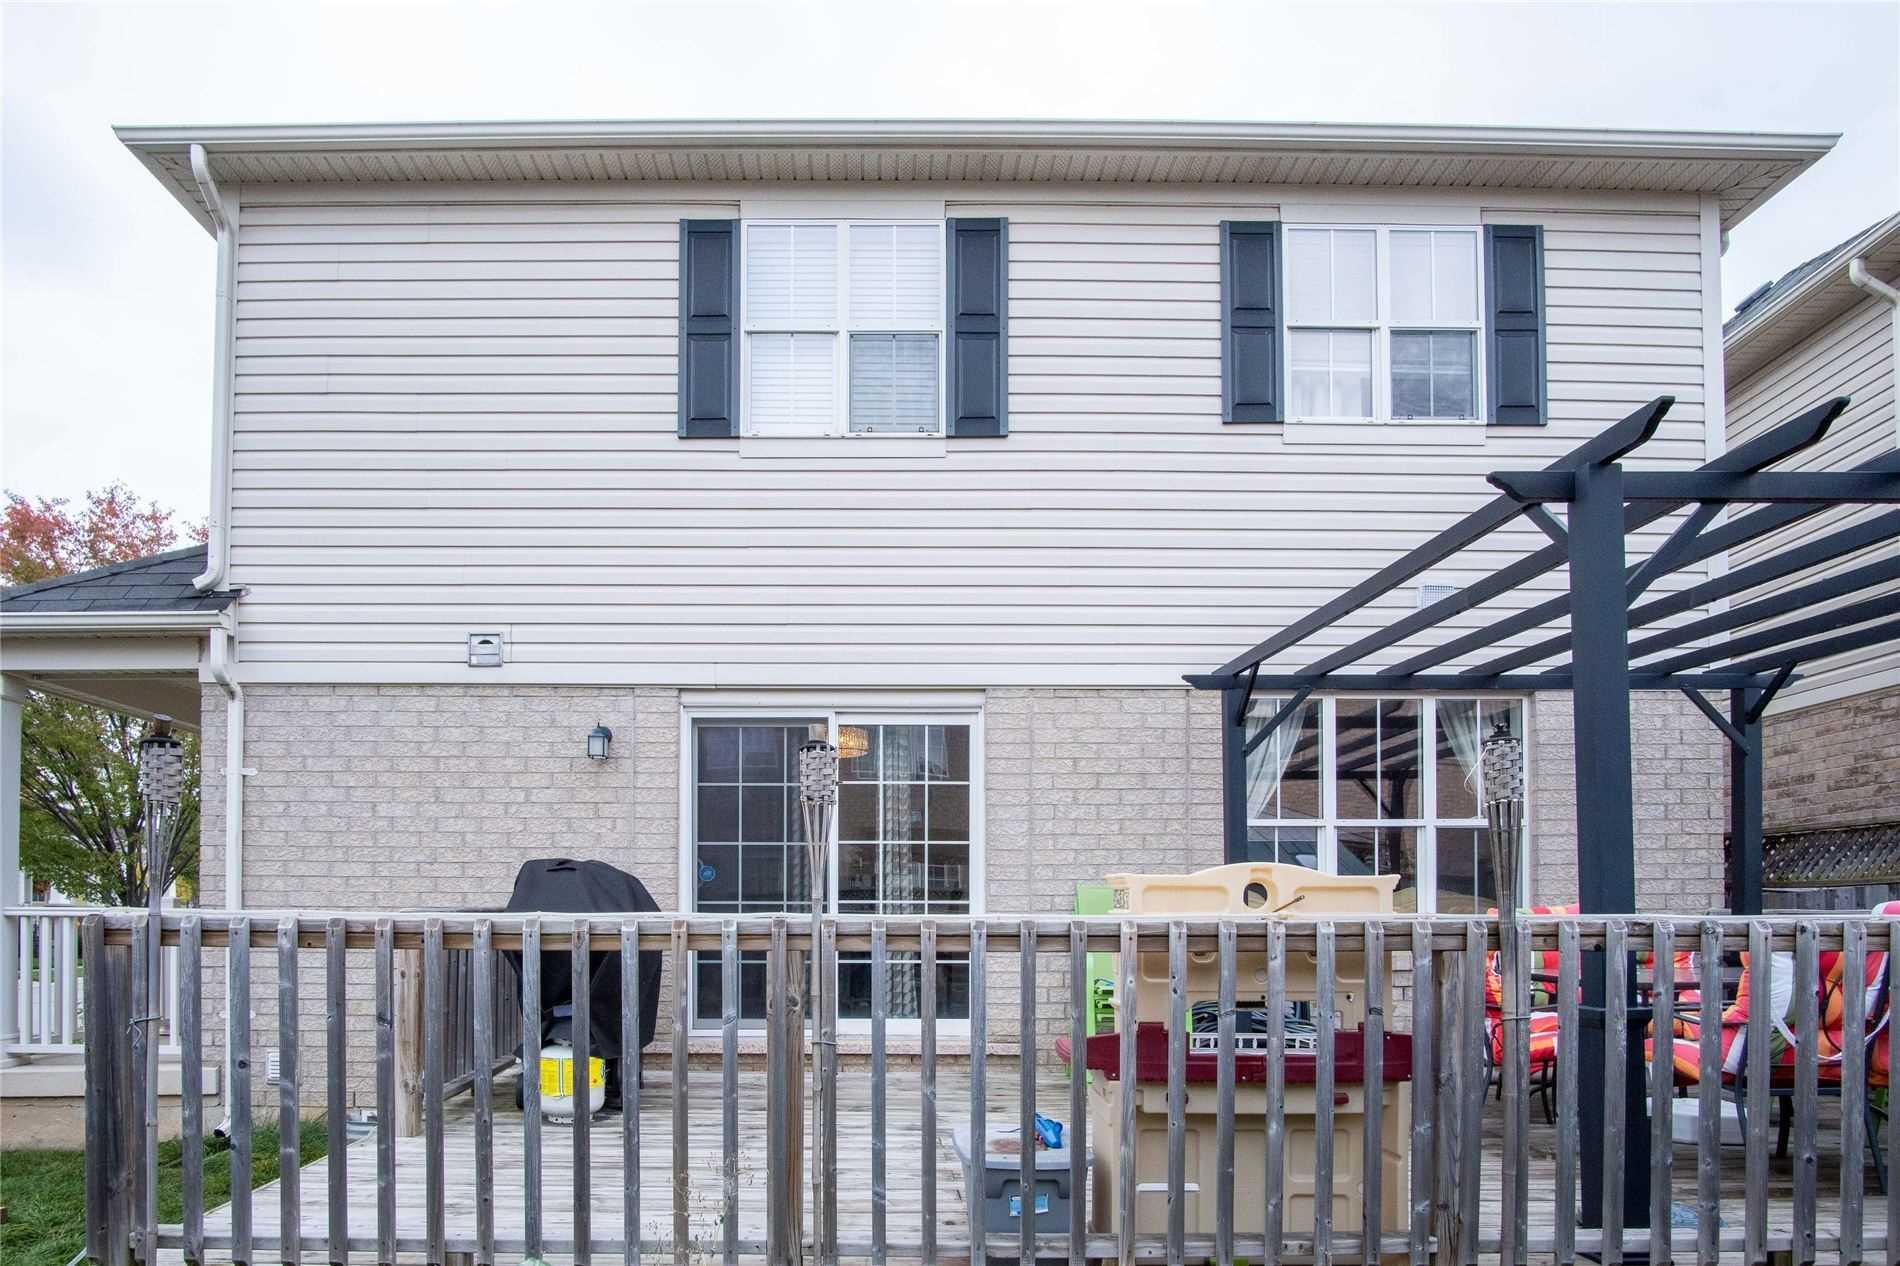 827 Biggar Hts - Coates Detached for sale, 4 Bedrooms (W5400280) - #17